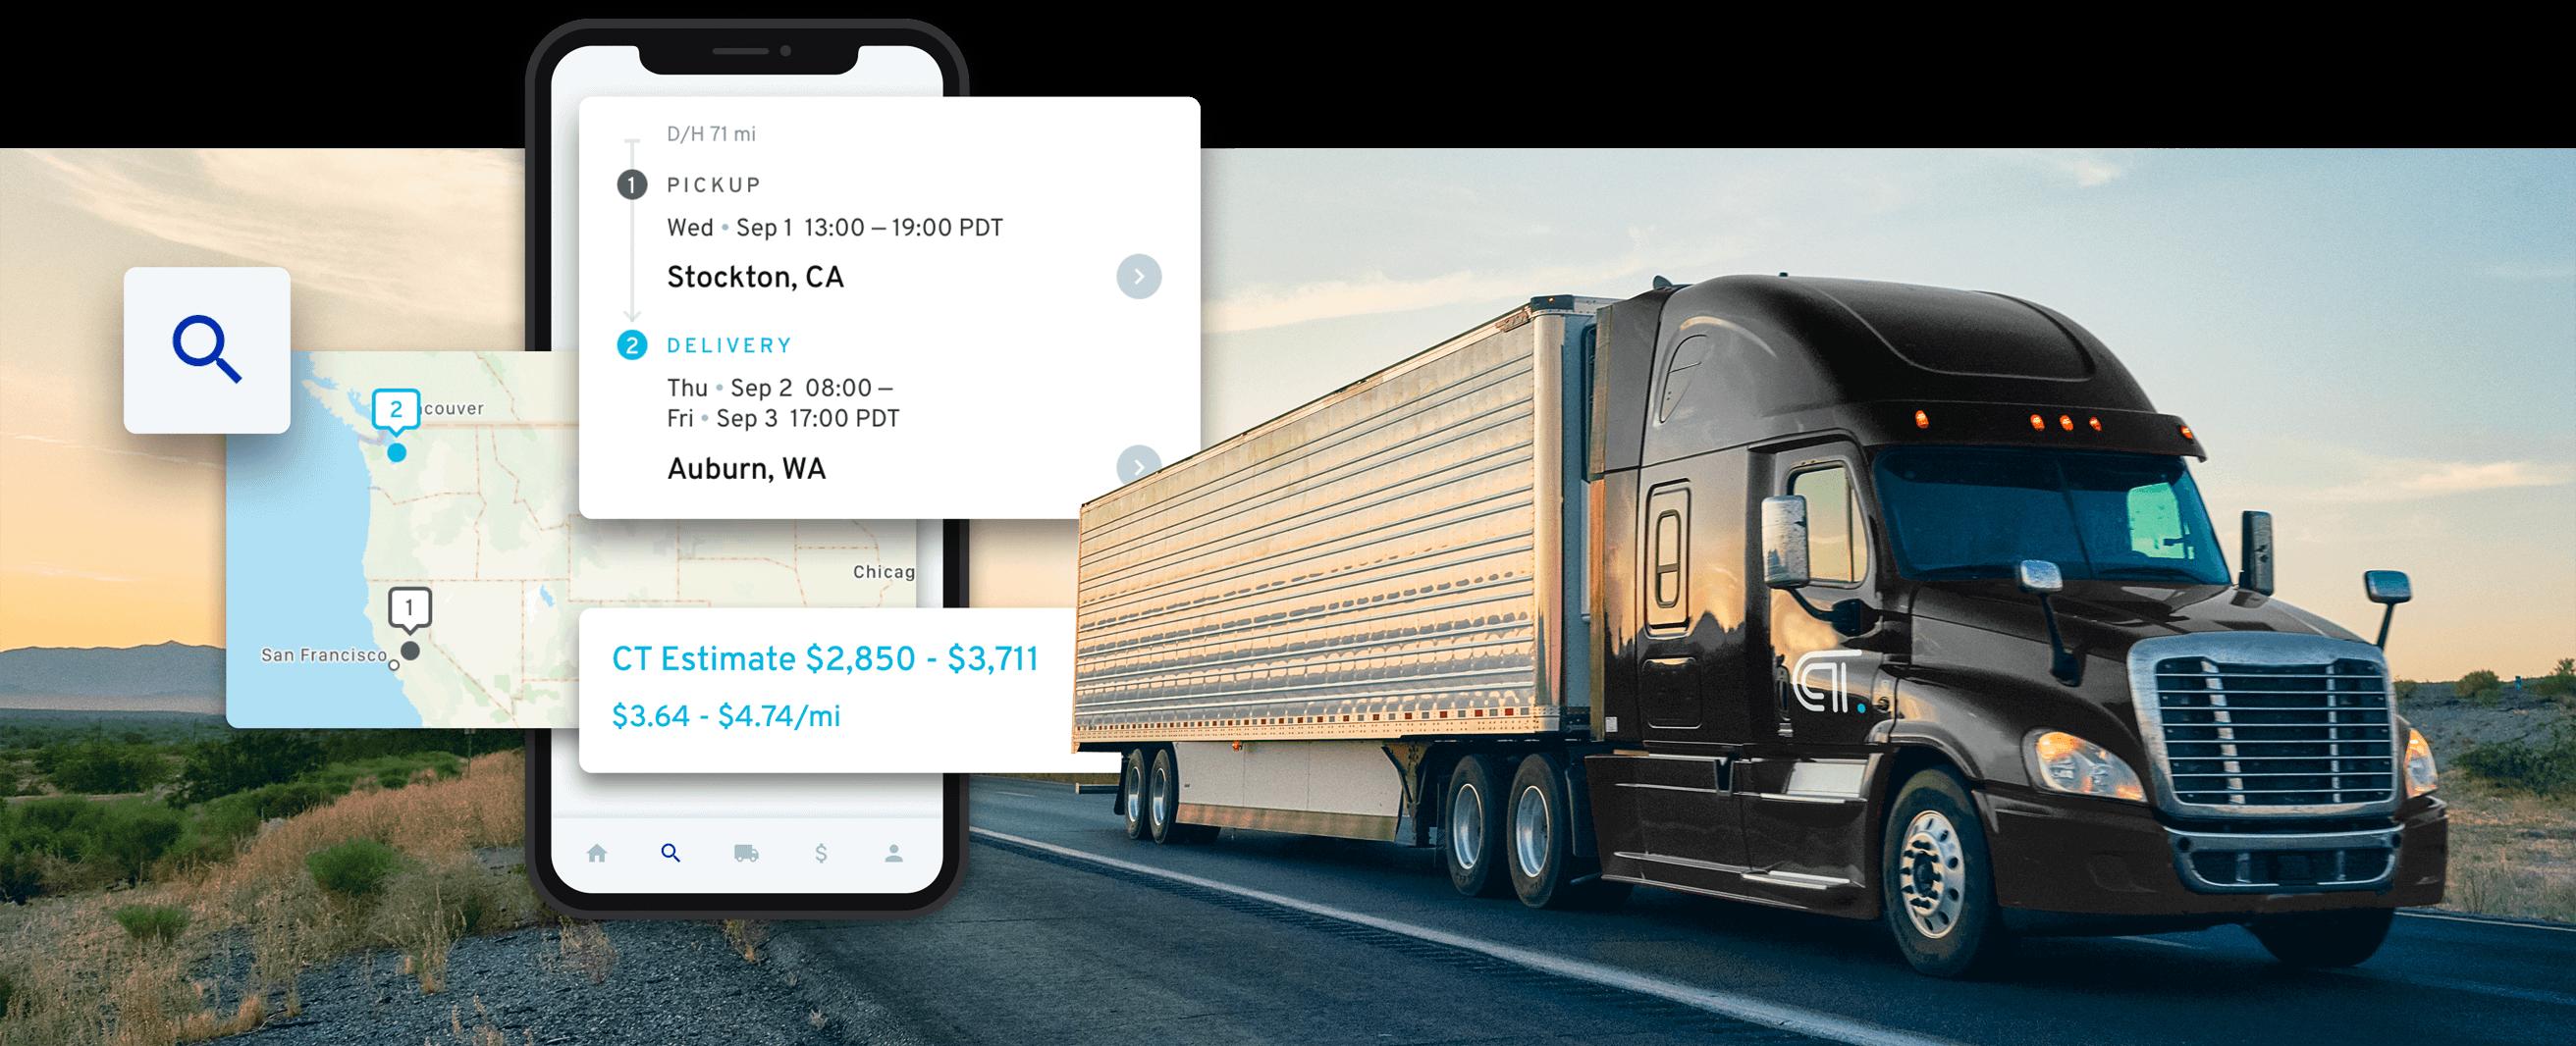 CloudTrucks UI and semi-truck